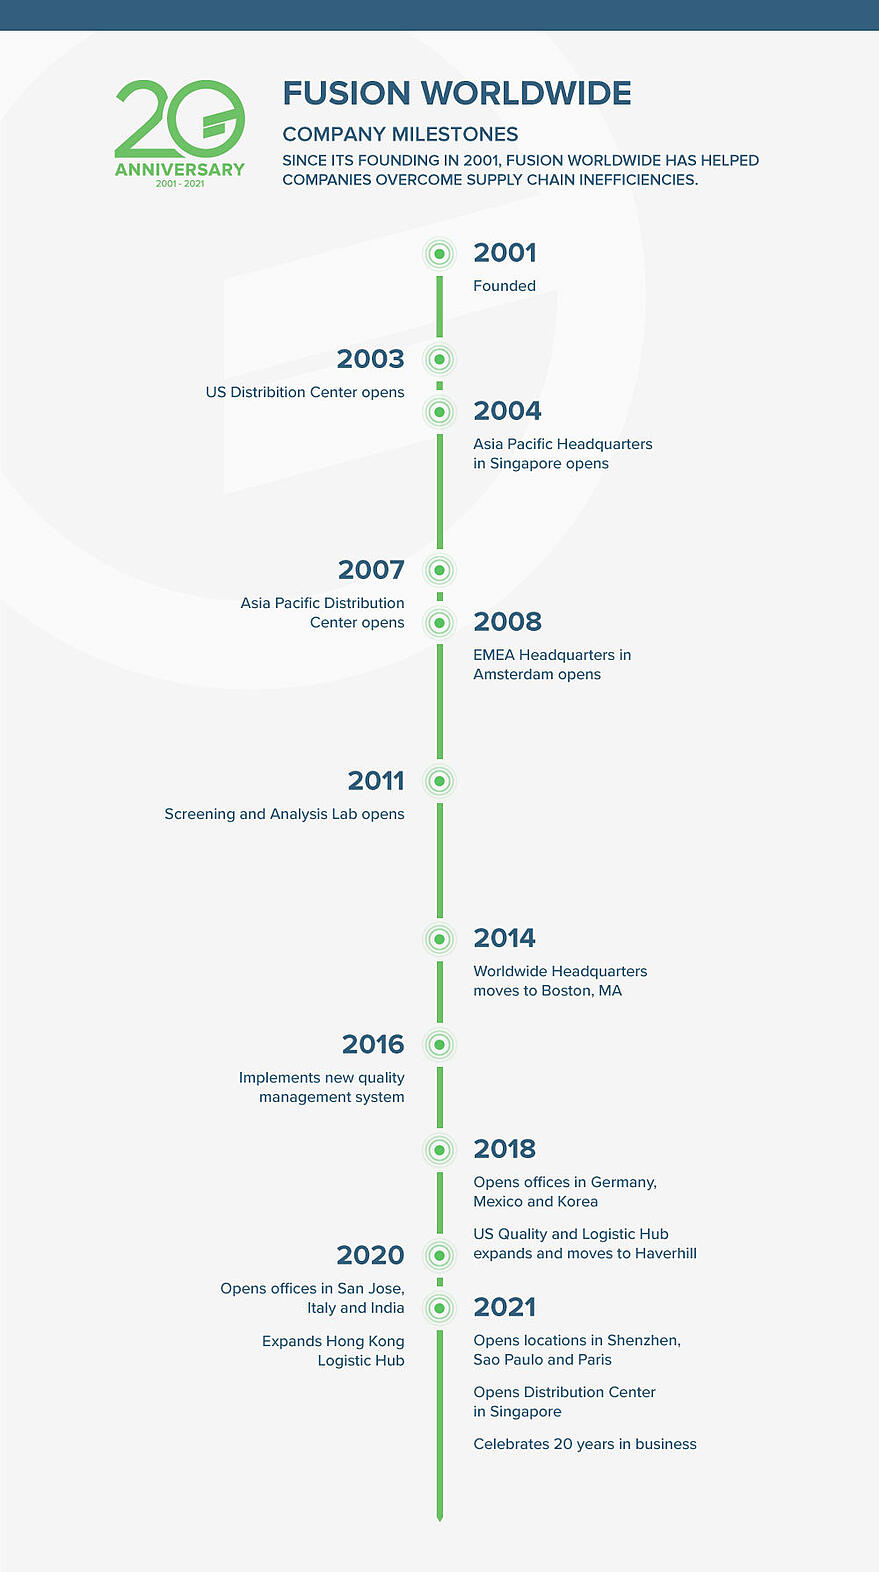 Fusion_Worldwide_Milestones